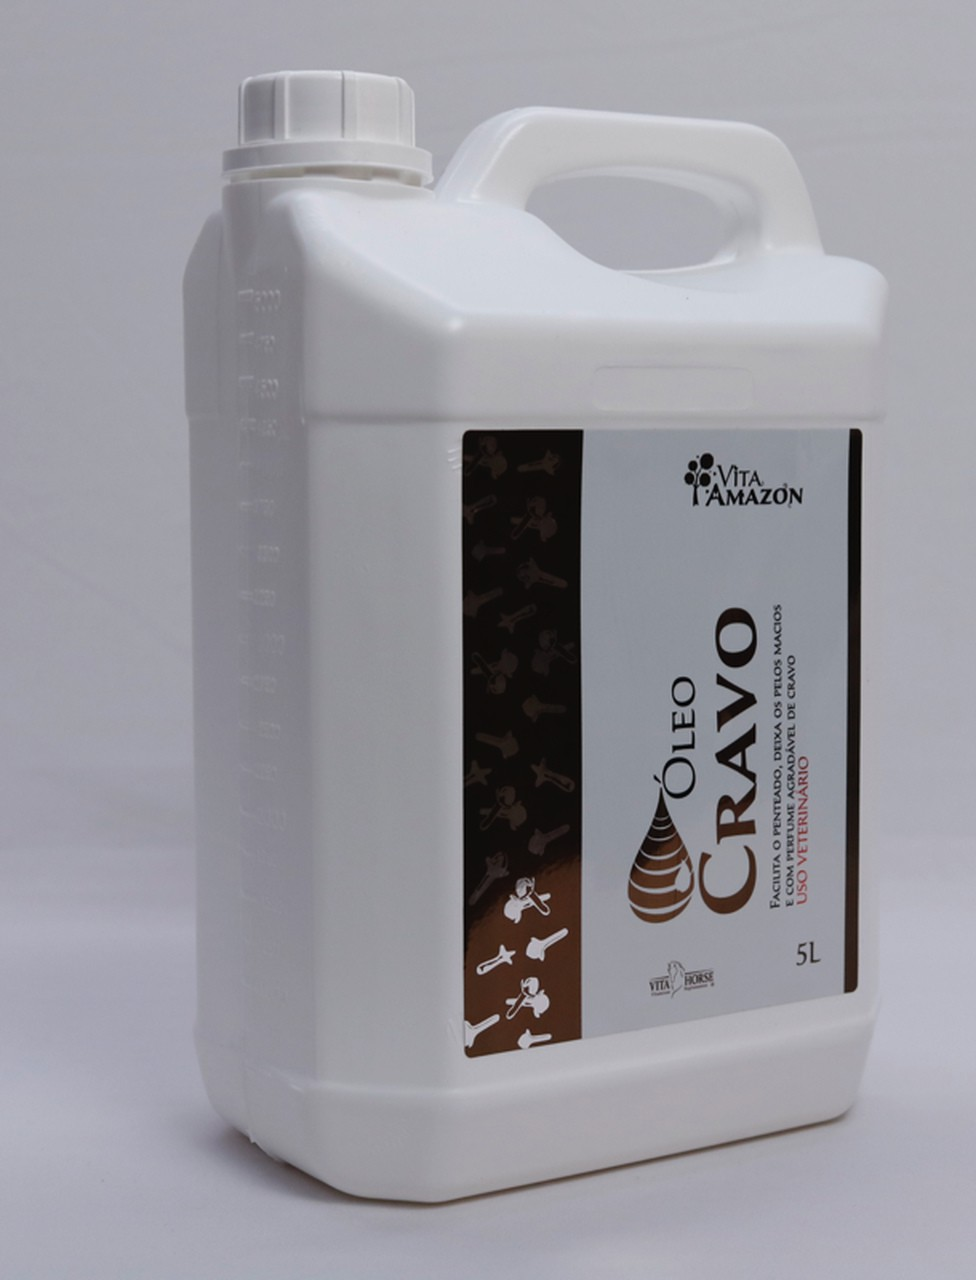 OLEO DE CRAVO  (REPELENTE)